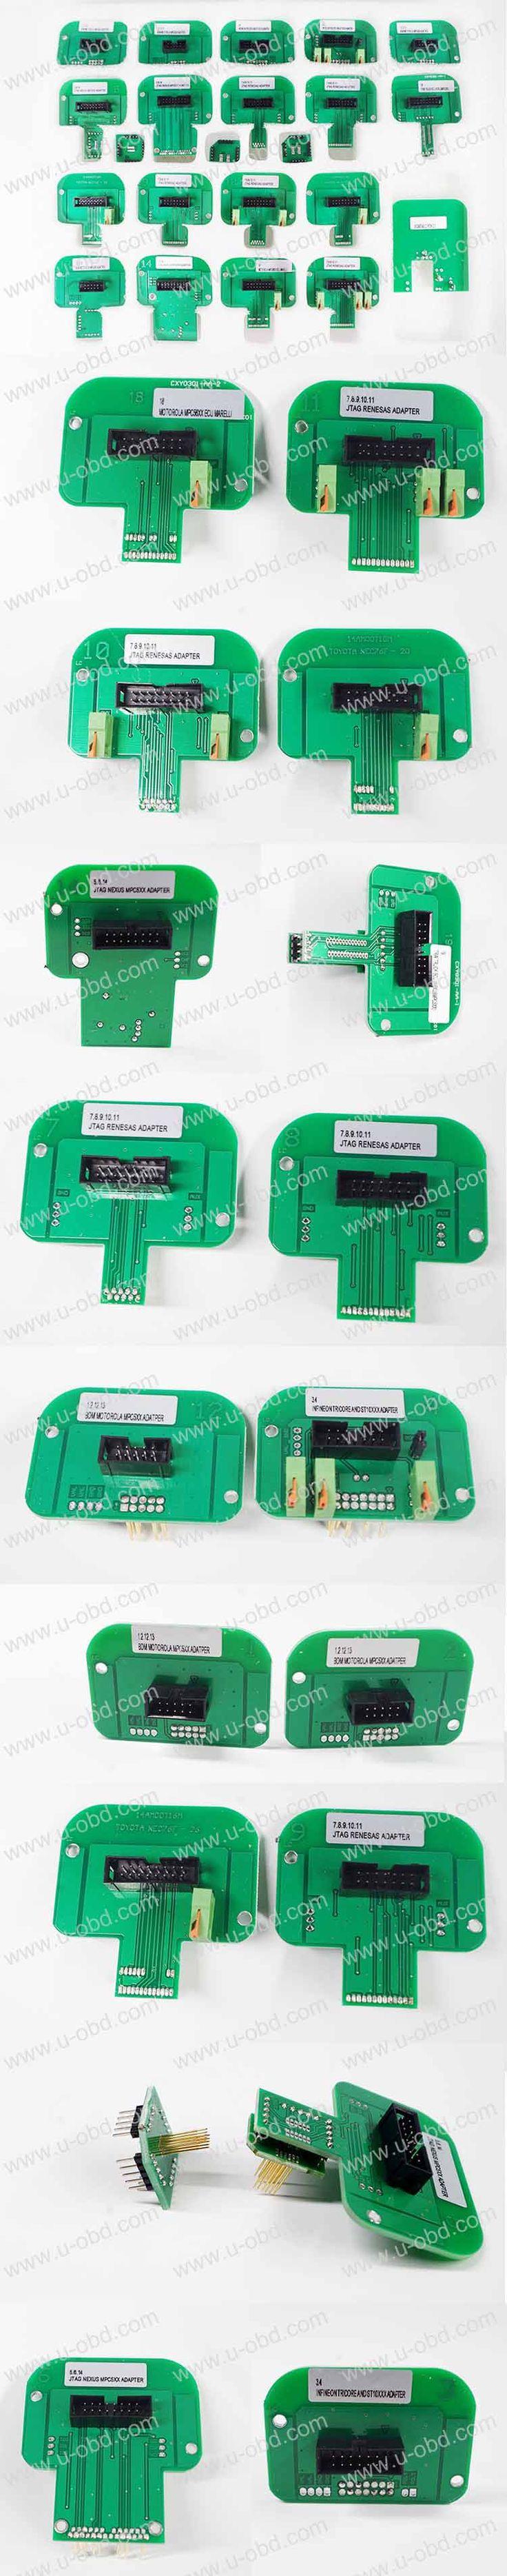 KTAG KESS KTM Dimsport BDM Probe Adapters Full Set for Denso, Marelli, Bosch, Siemens ECU, 22 different types, necessary tools for Tuning and Remap ECU: http://www.u-obd.com/product/ktag-kess-ktm-dimsport-bdm-probe-adapters/